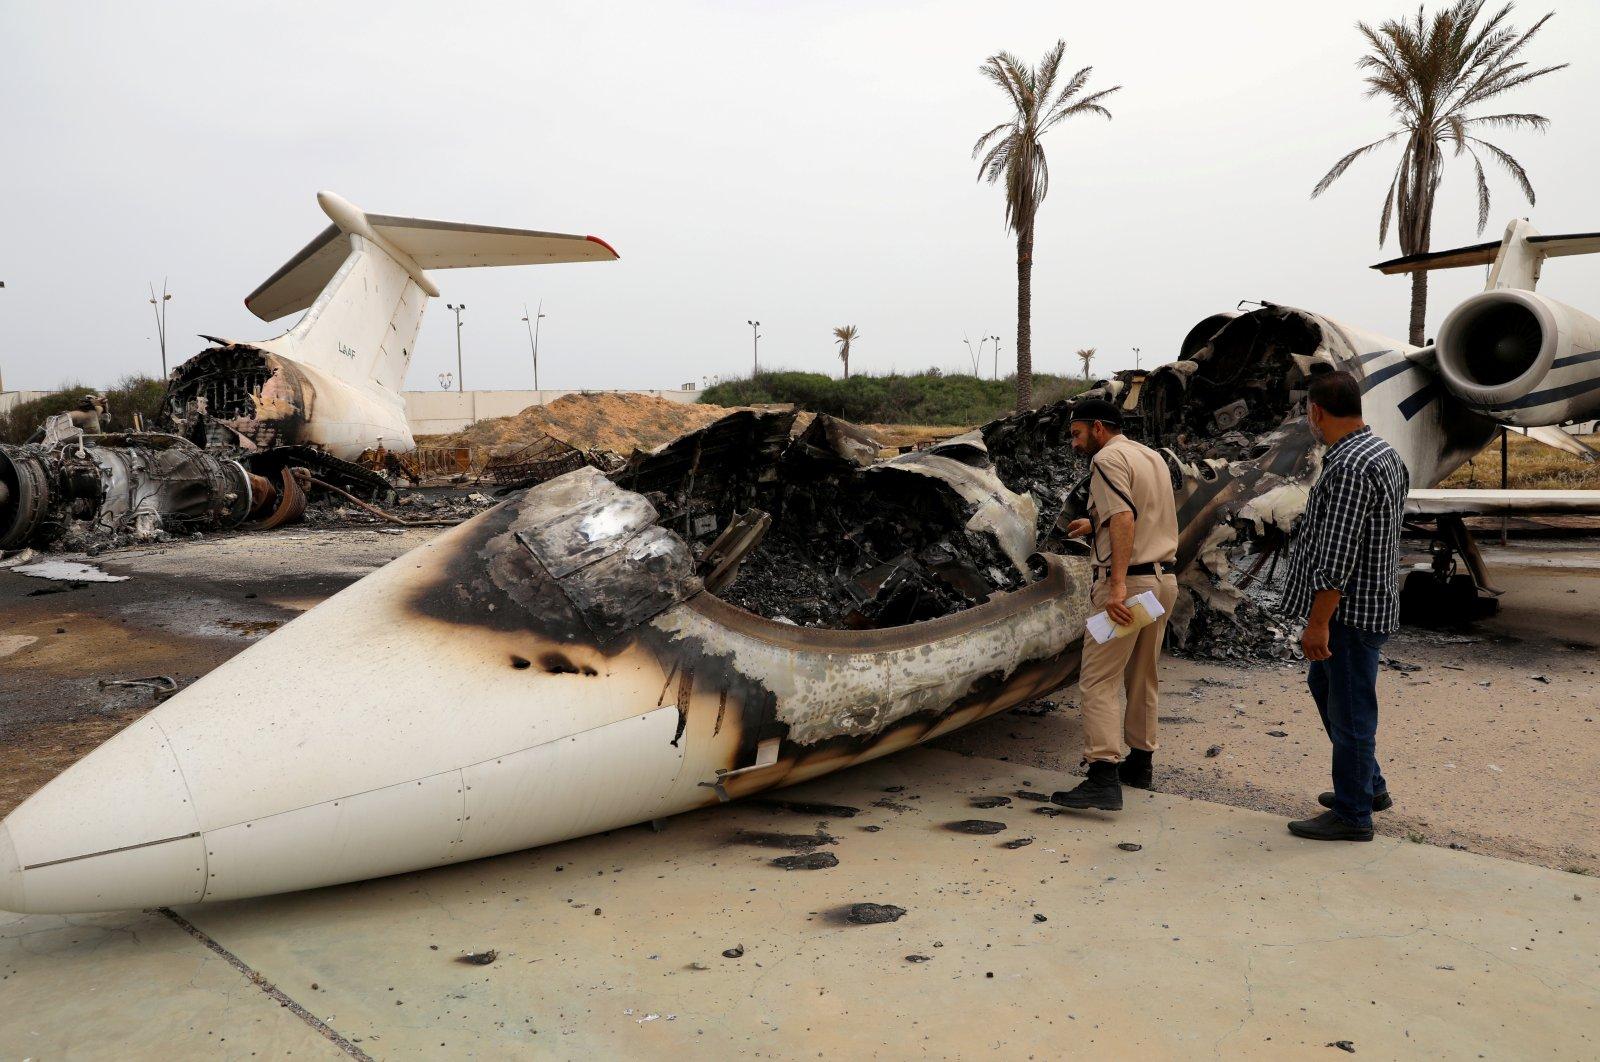 A policeman and a man inspect a passenger plane damaged by shelling at Mitiga airport, Tripoli, Libya May 10, 2020. (Reuters File Photo)